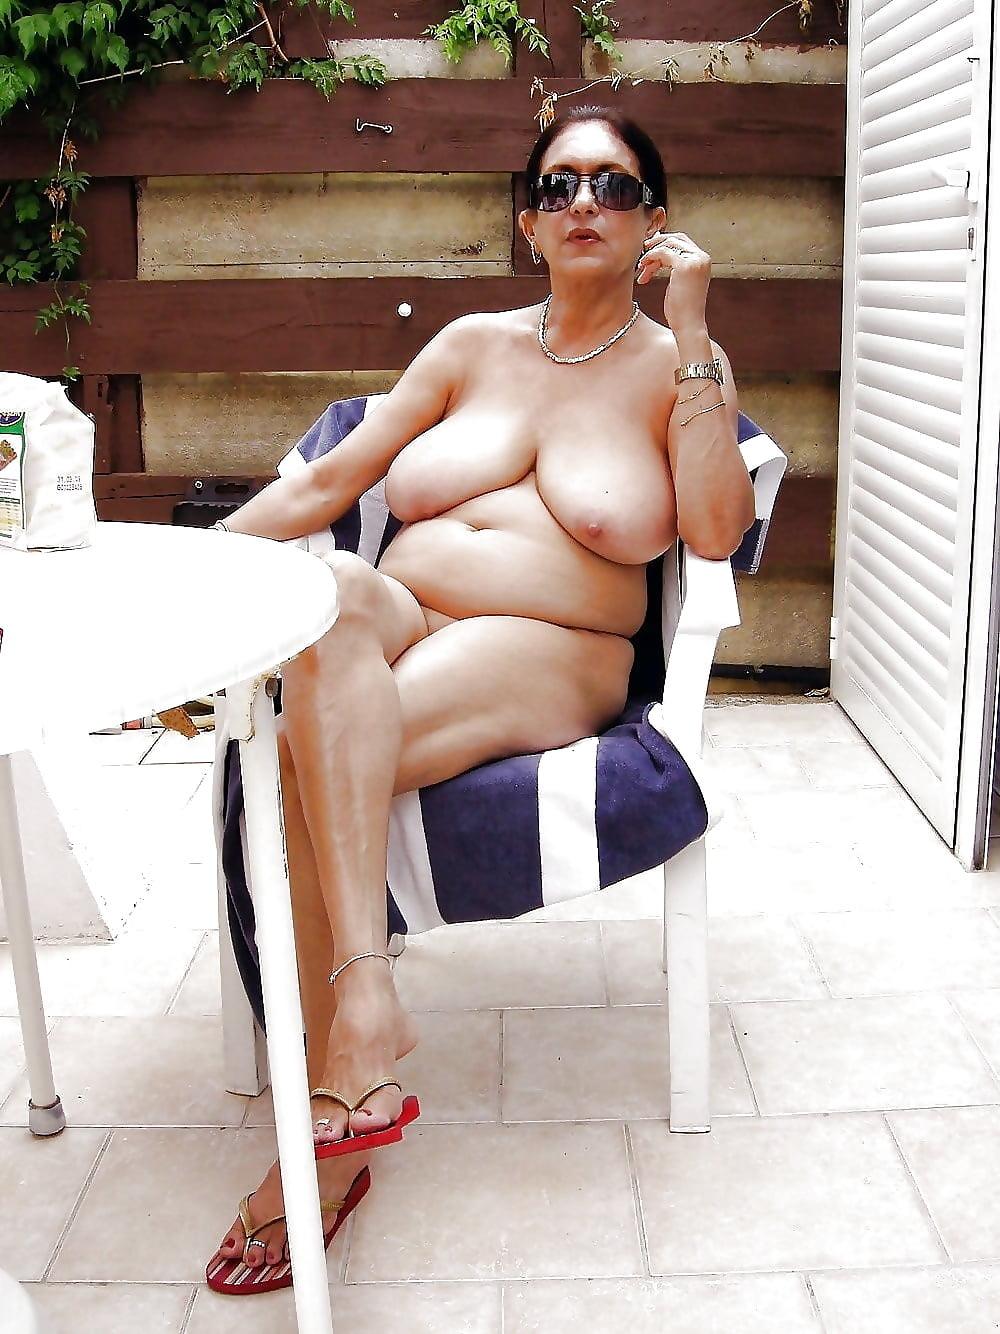 Old naked ladies tumblr-2856